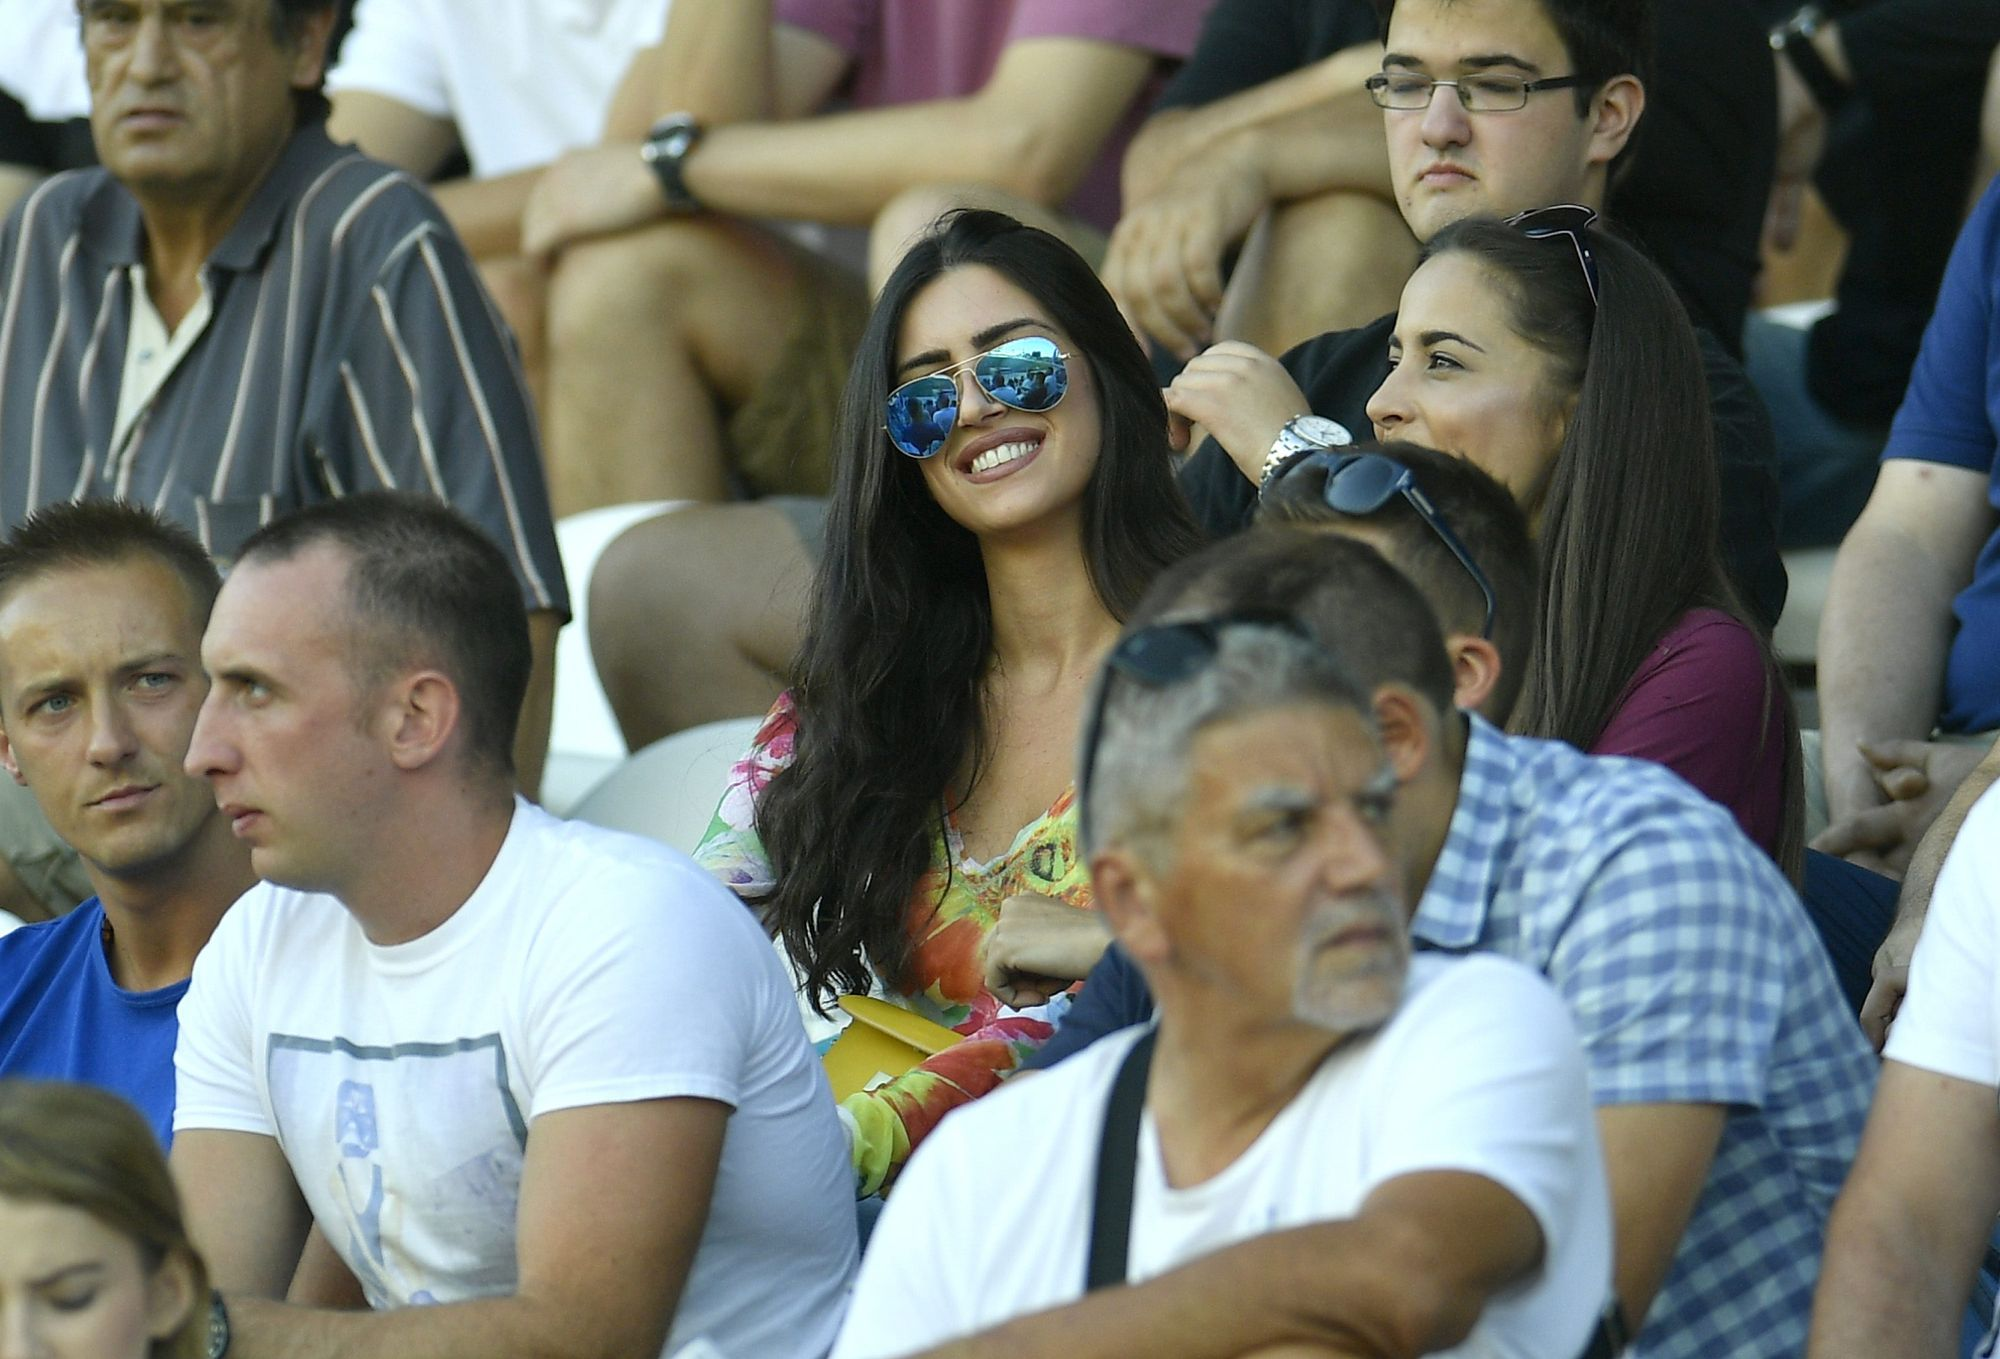 Zagreb, 280816. Stadion NK Zagreb. Utakmica 7. kola MAXtv 1. HNL,  Lokomotiva - Hajduk. Na fotografiji: navijacice. Foto: Ronald Gorsic / CROPIX